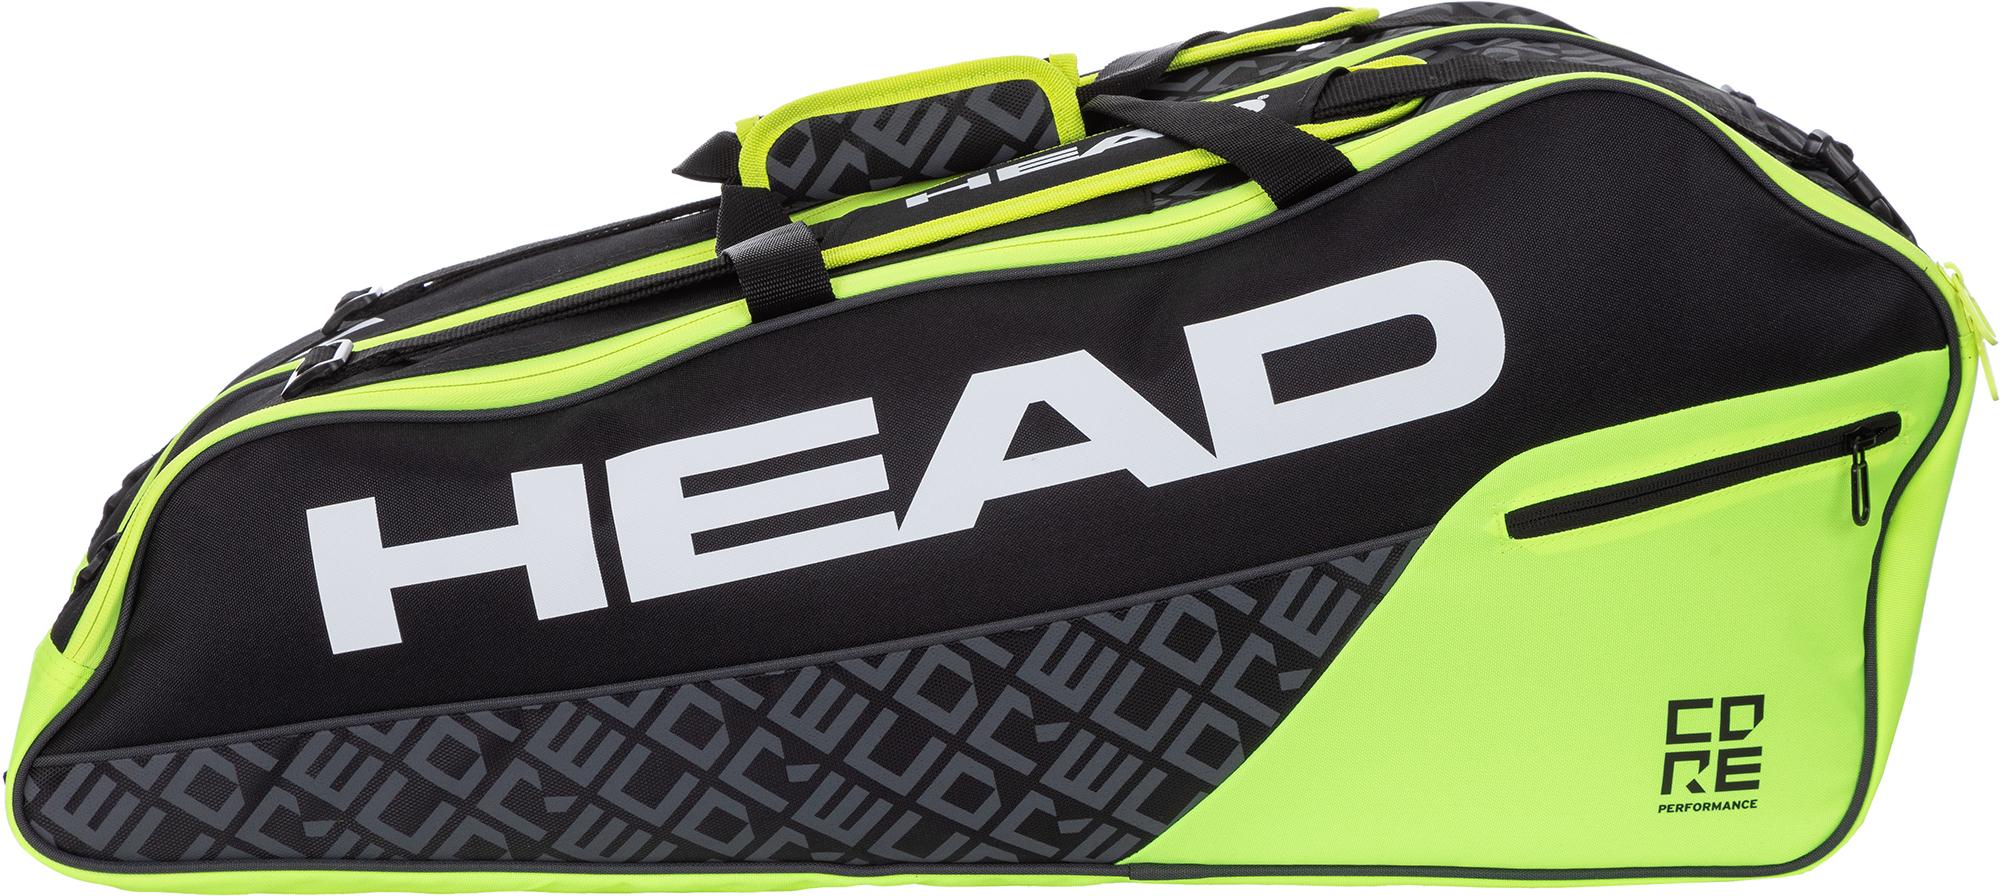 Head Сумка для 6 ракеток Head CORE 6R Combi head сумка head tour team 6r combi